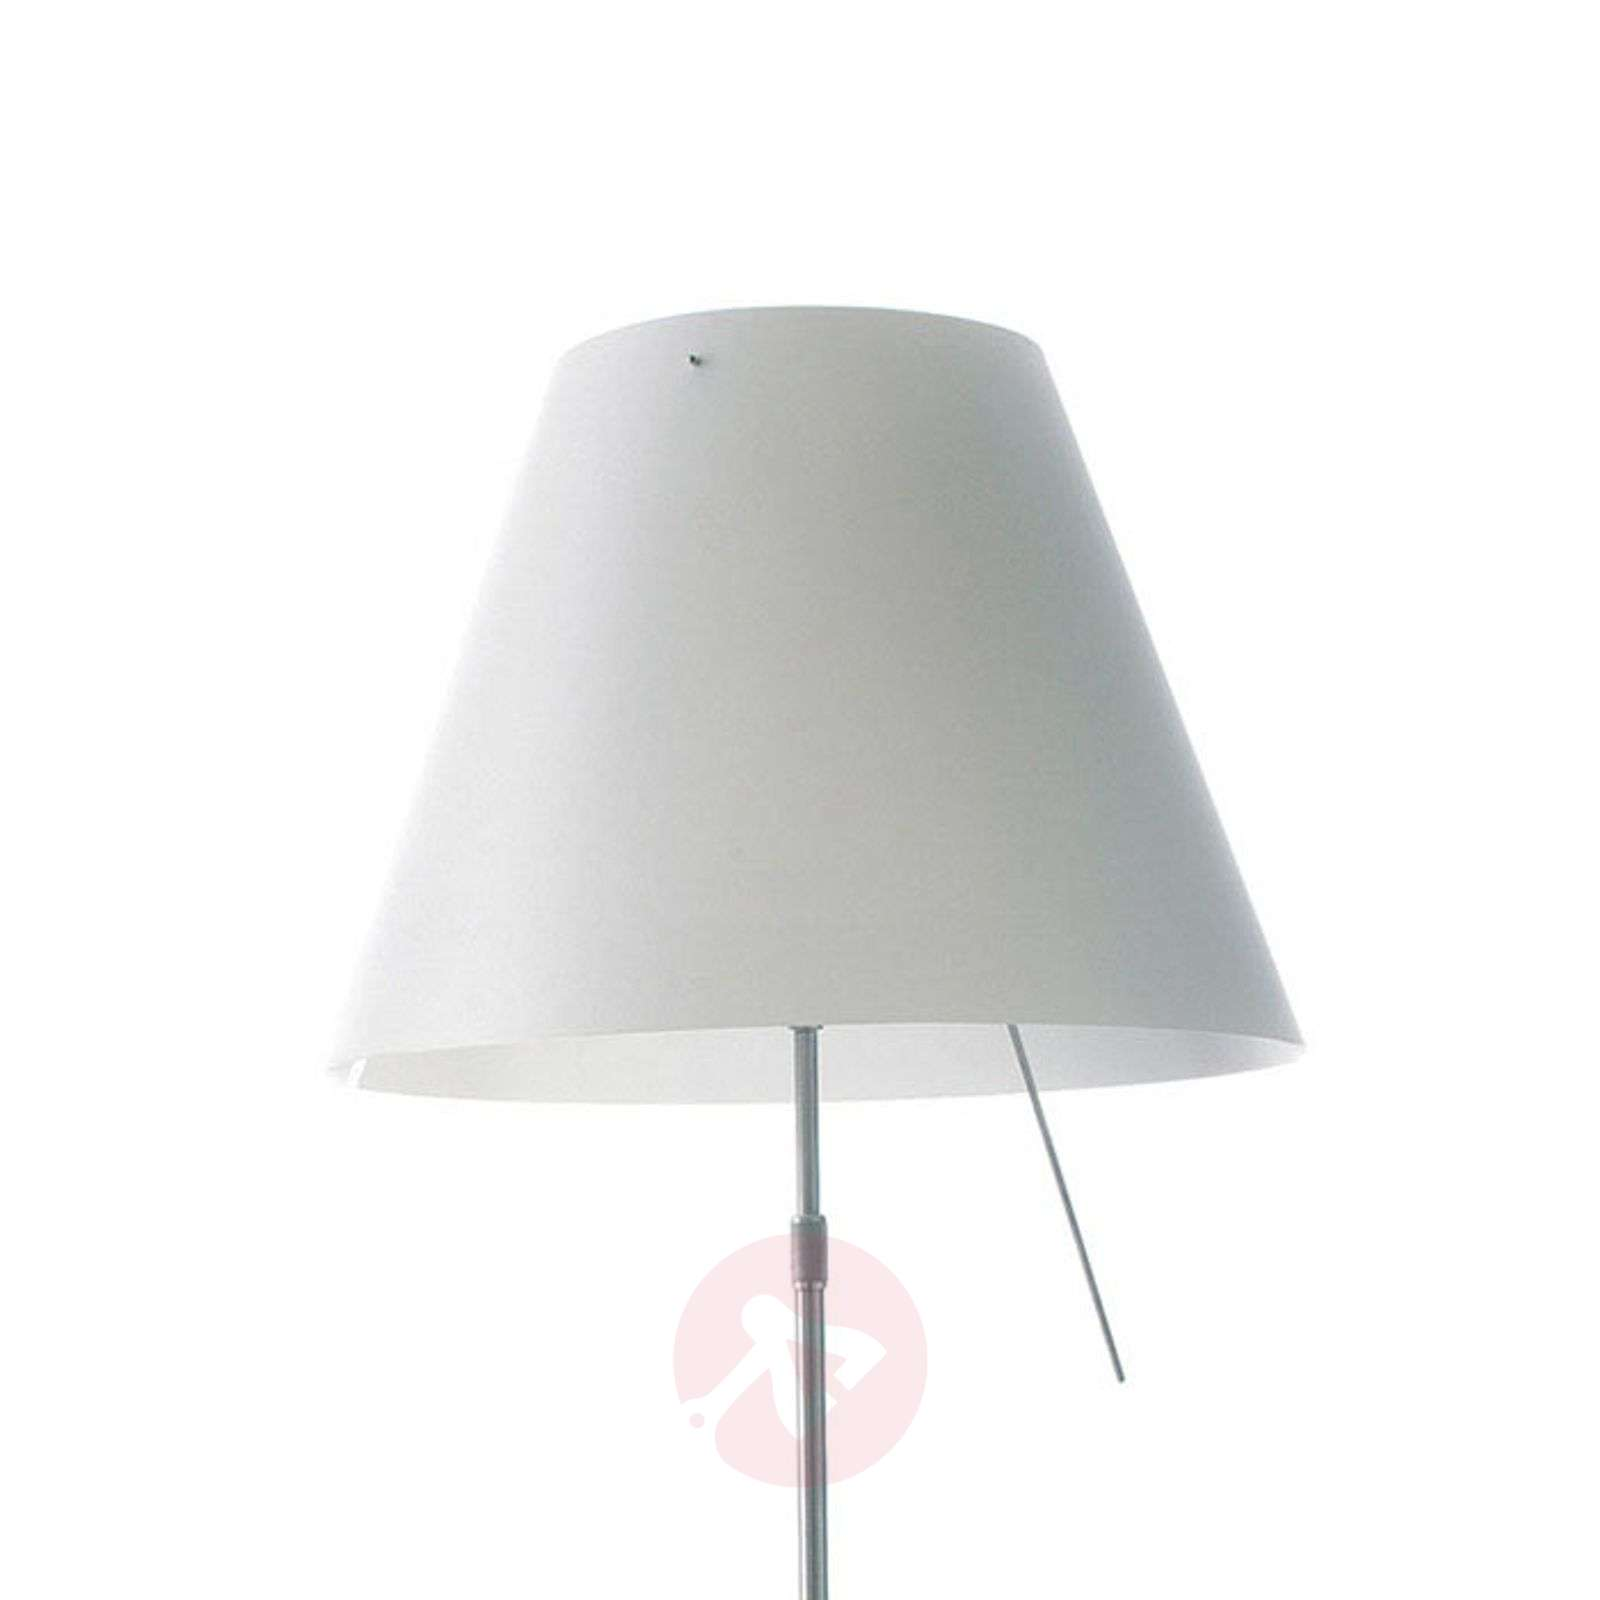 Luceplan Costanza floor lamp with Philips Hue bulb-6030167-01